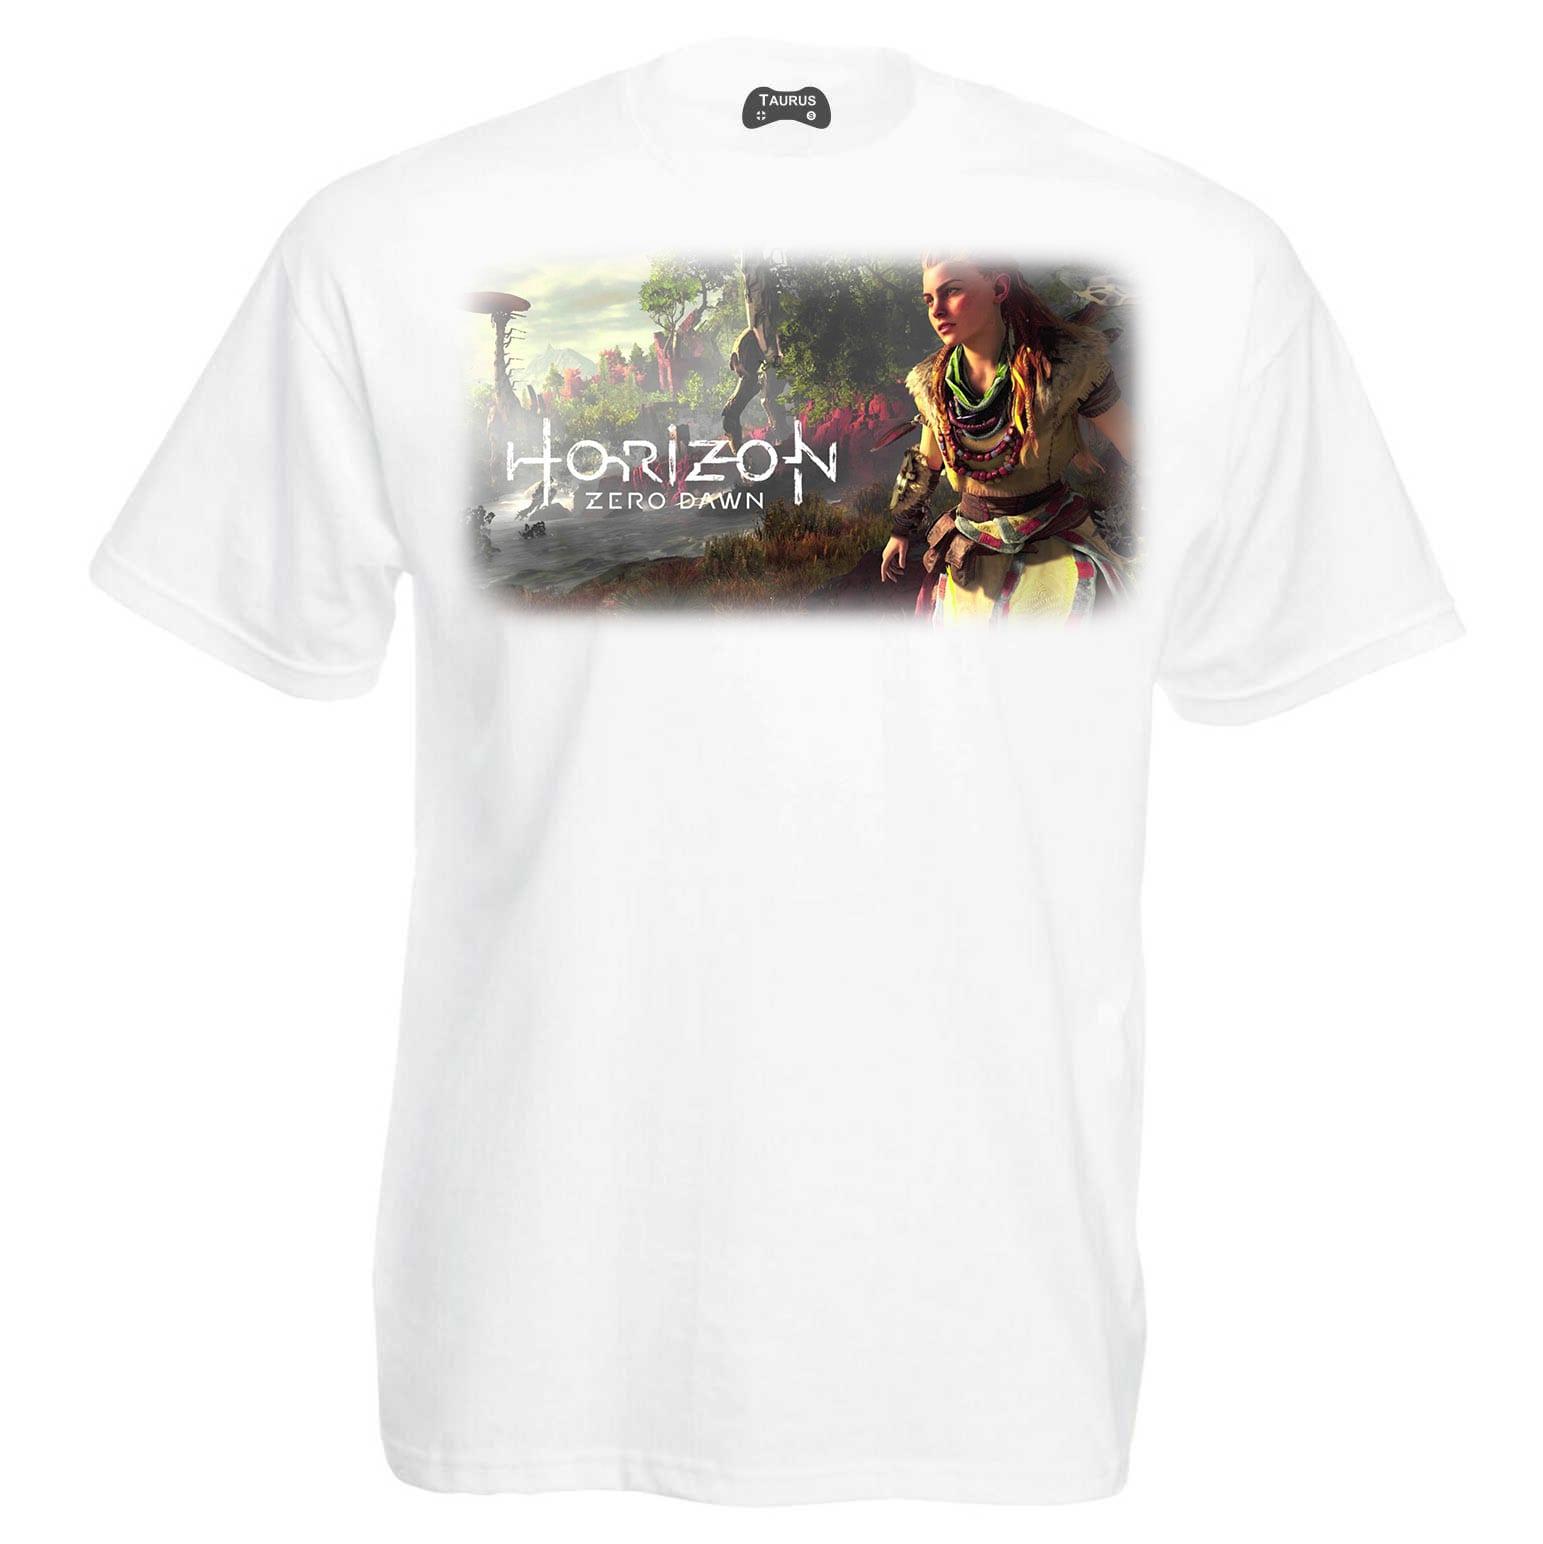 Horizon Zero Dawn T-Shirt Action